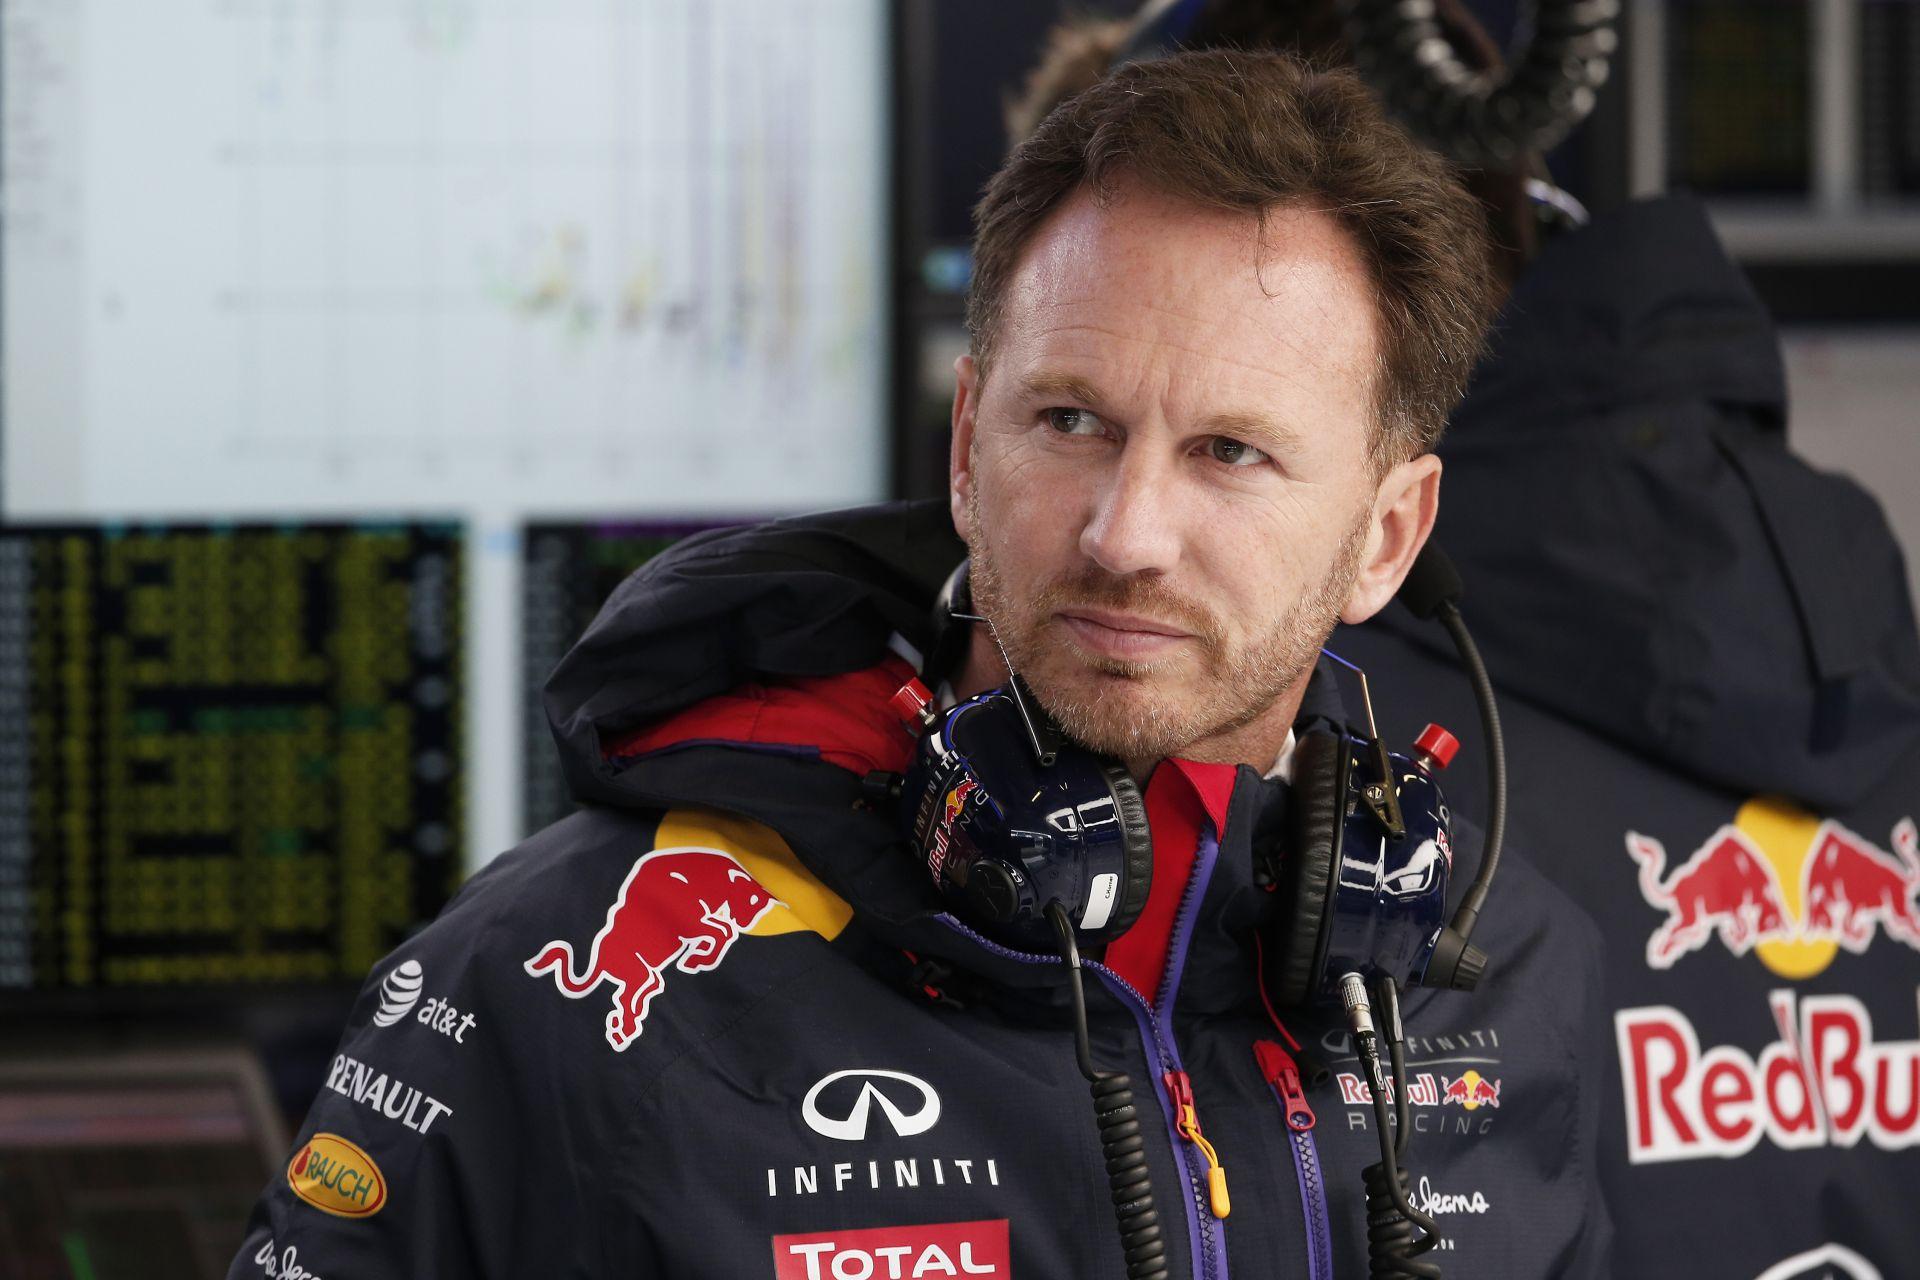 A Red Bull pénteki motorokat akar a Forma-1-ben